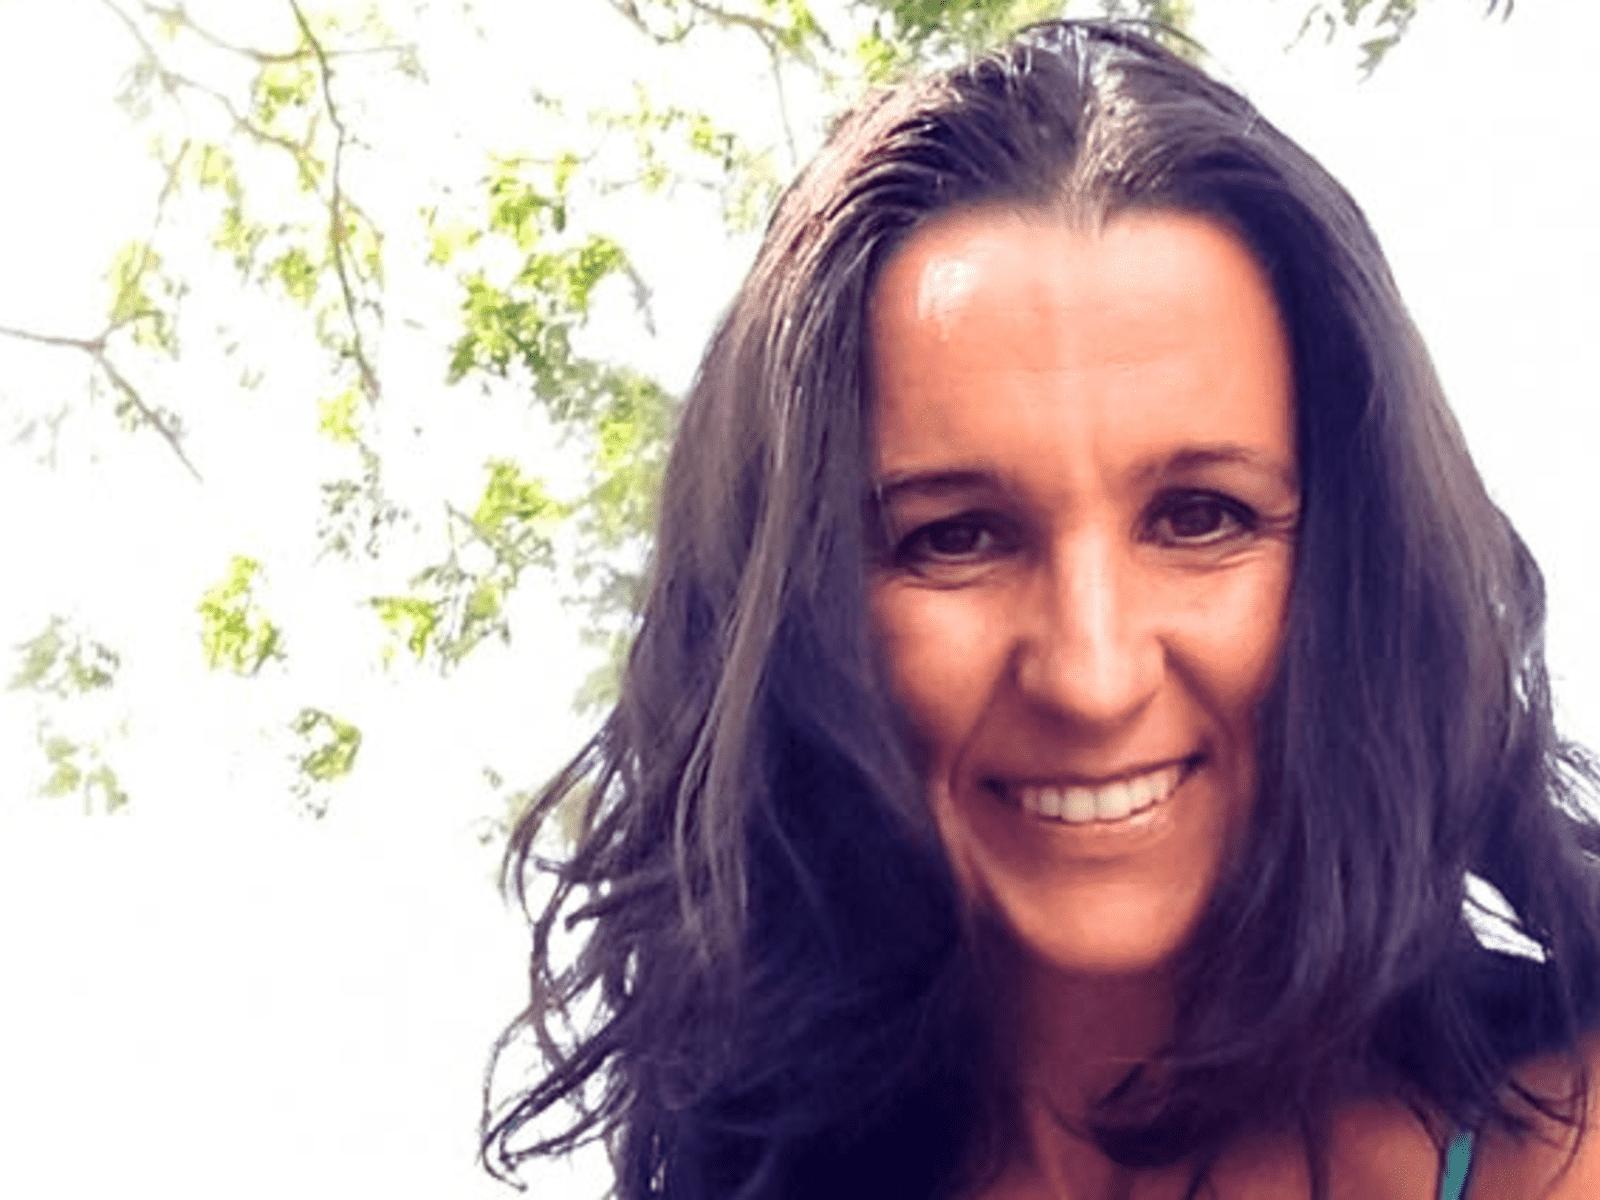 Elisabetta from Granada, Spain